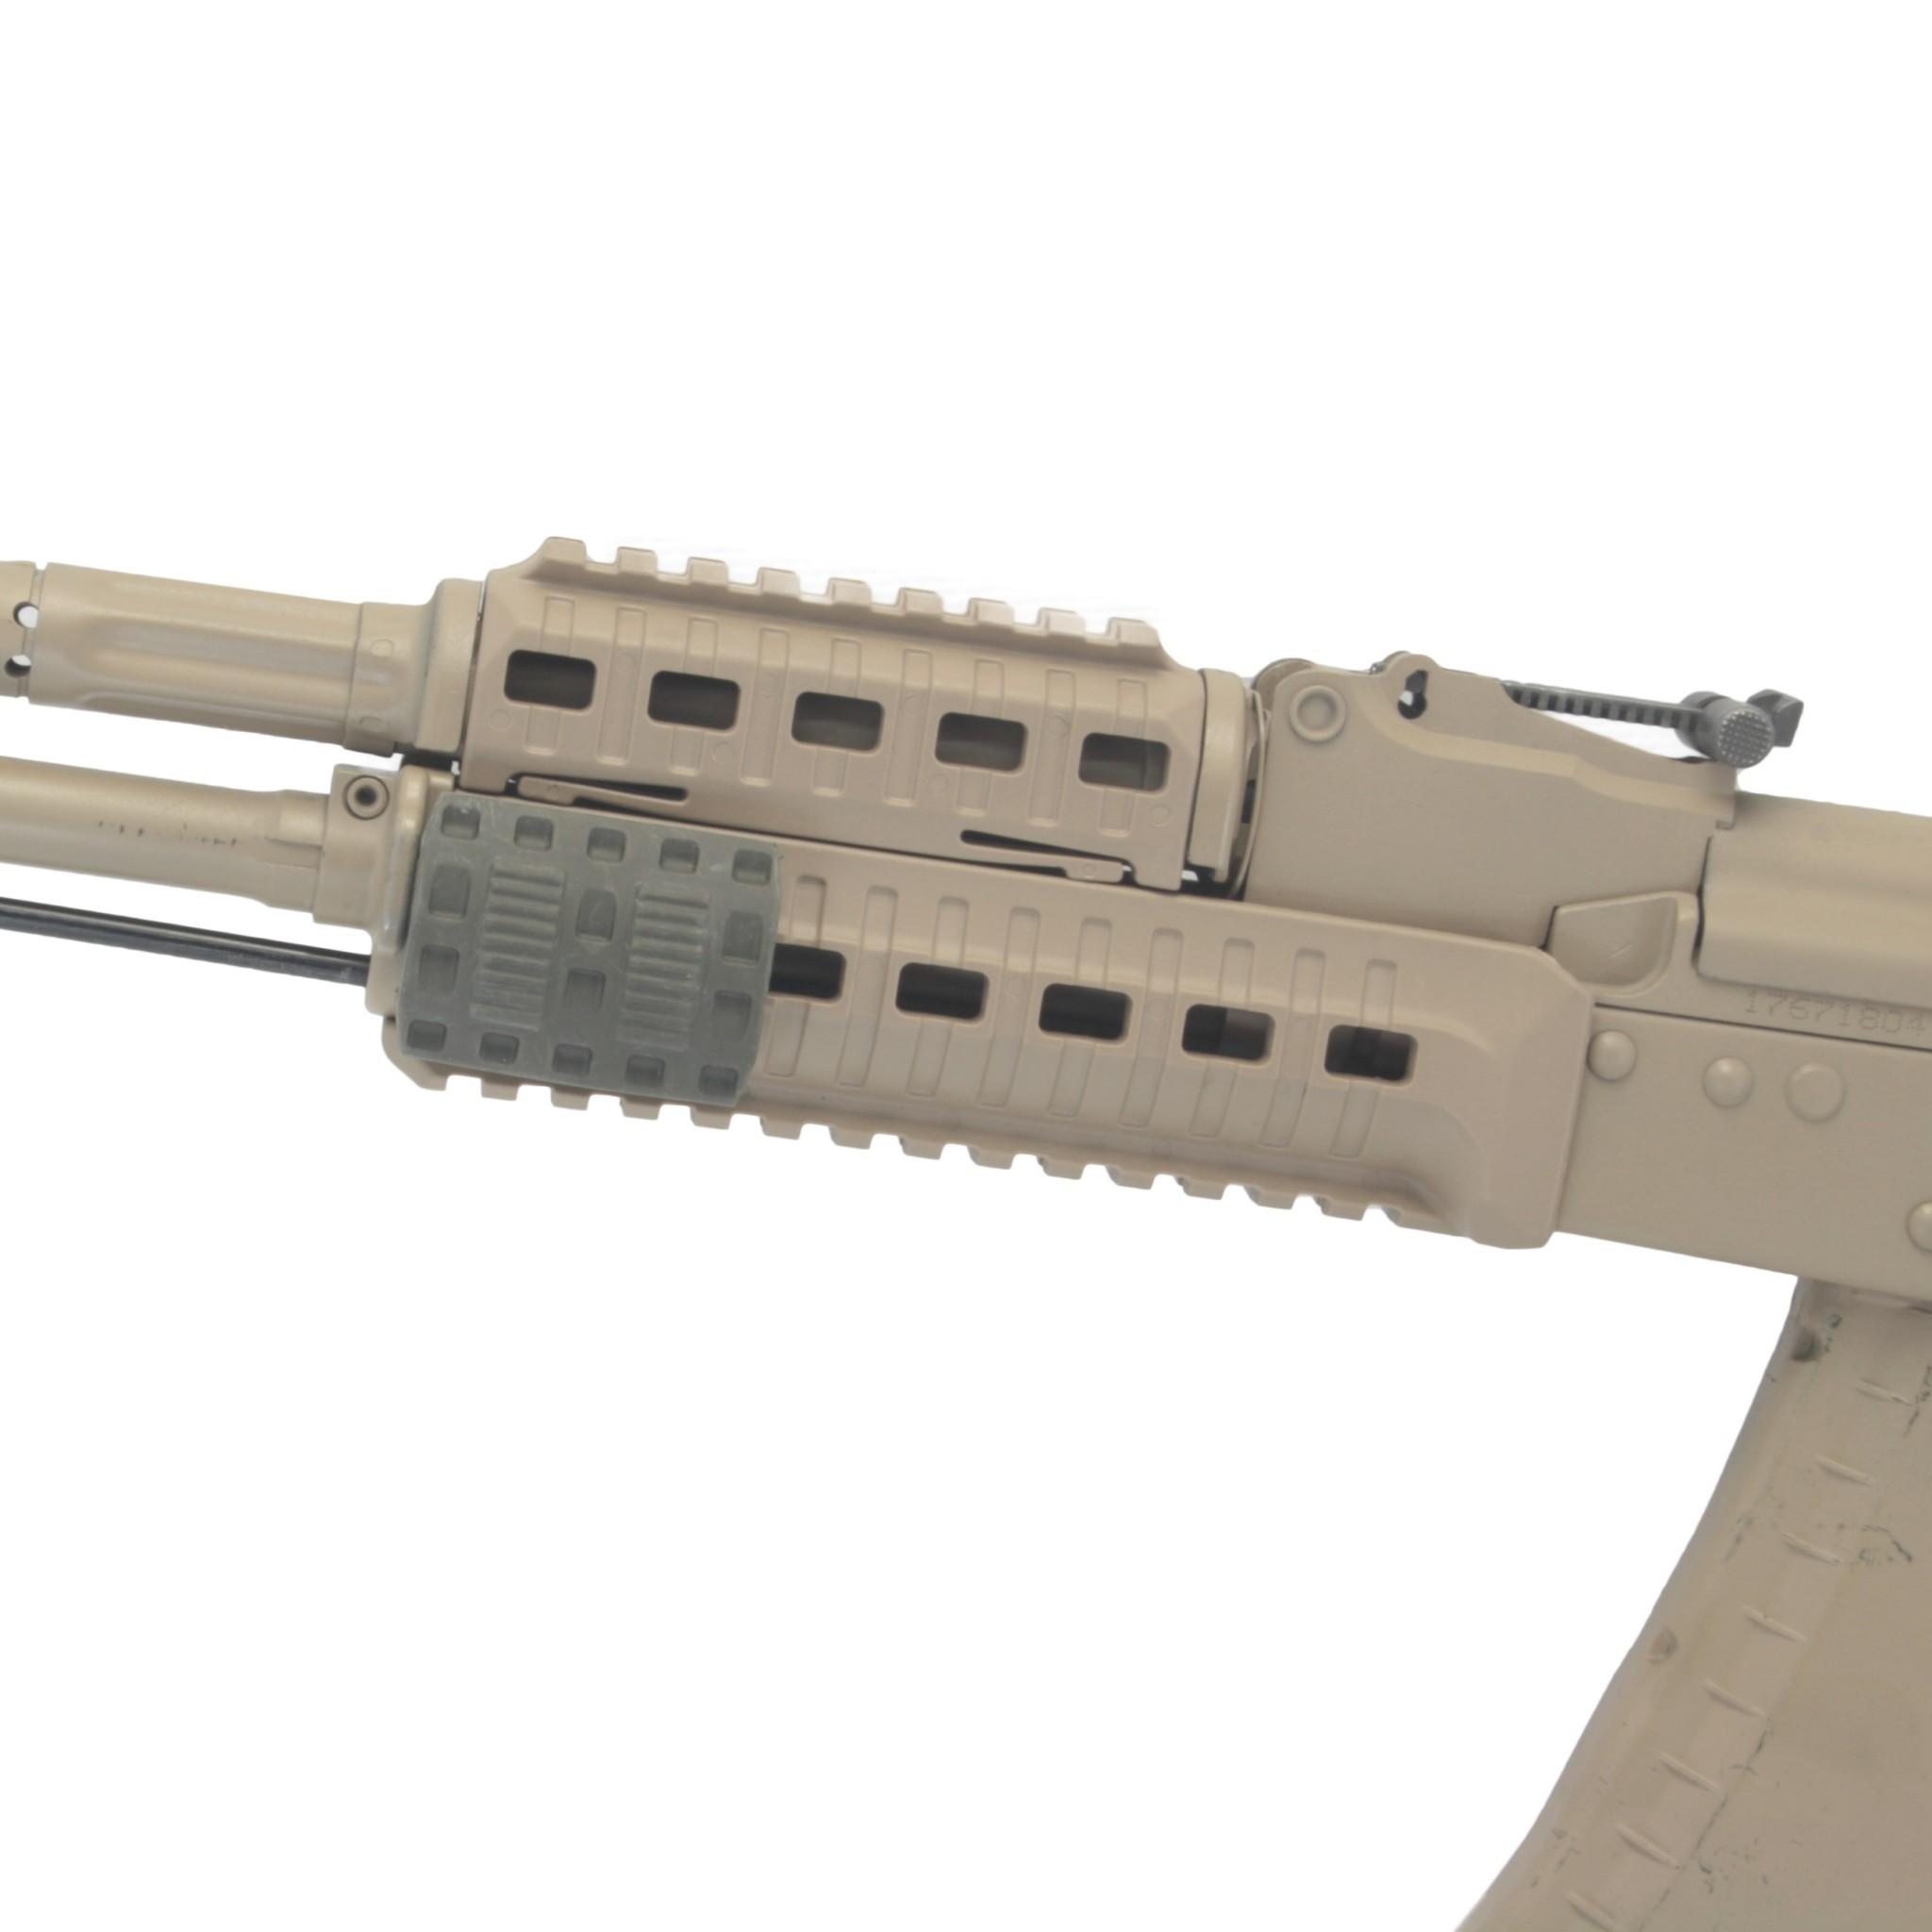 Накладка на планку Пикатинни 5 см, DLG Tactical - вид в сборе